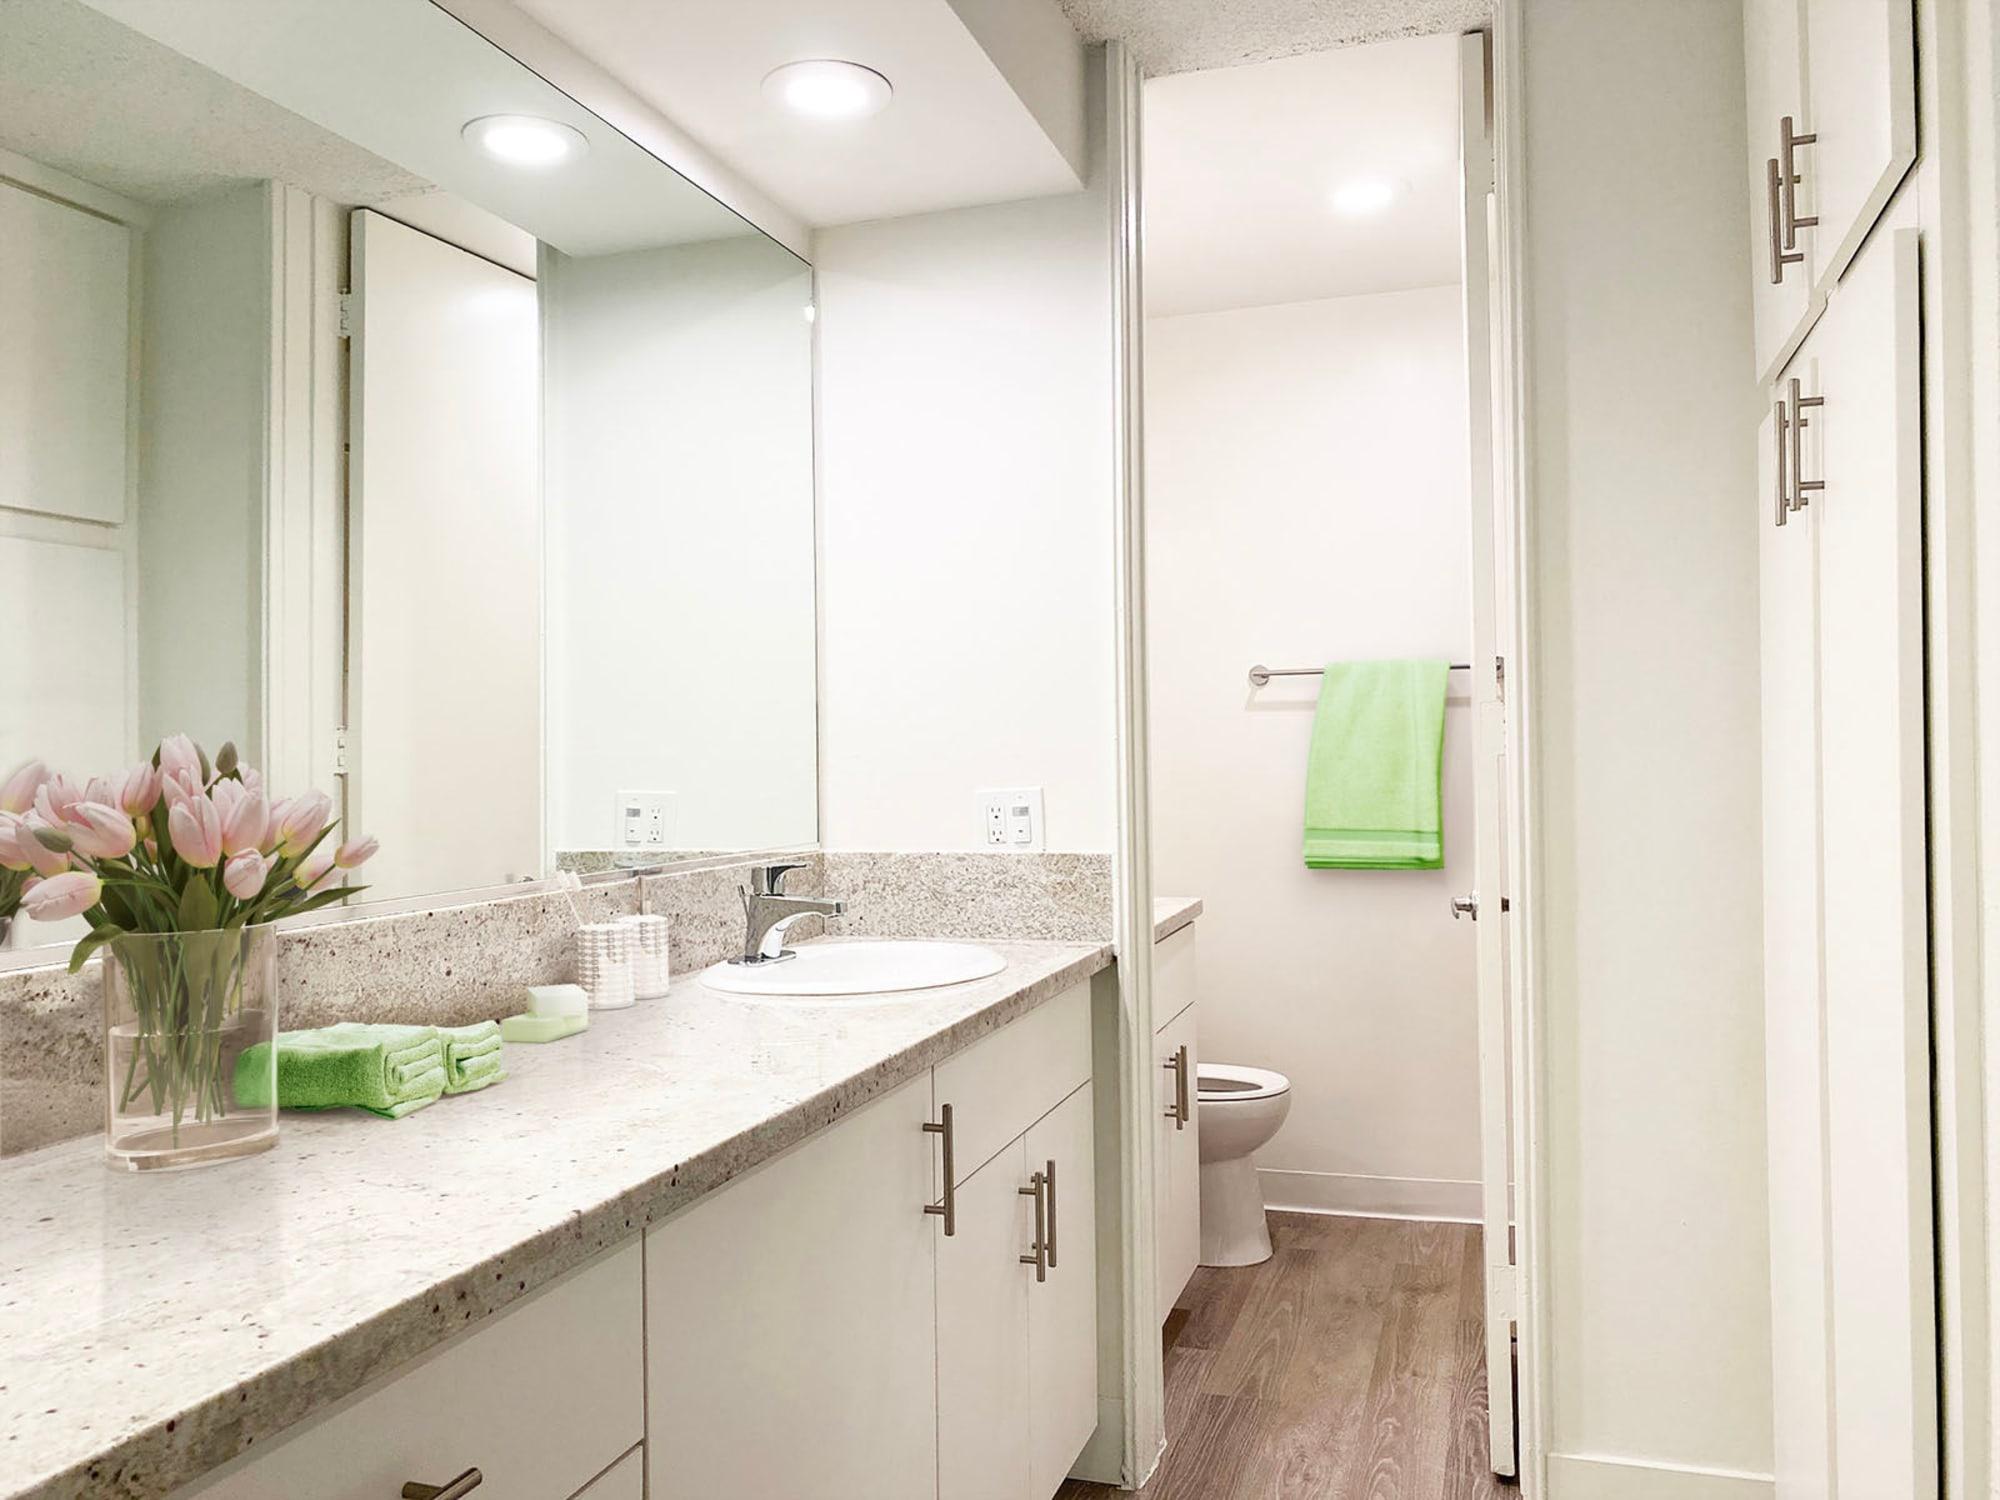 Large vanity mirror and a granite countertop in a model apartment's bathroom at Casa Granada in Los Angeles, California